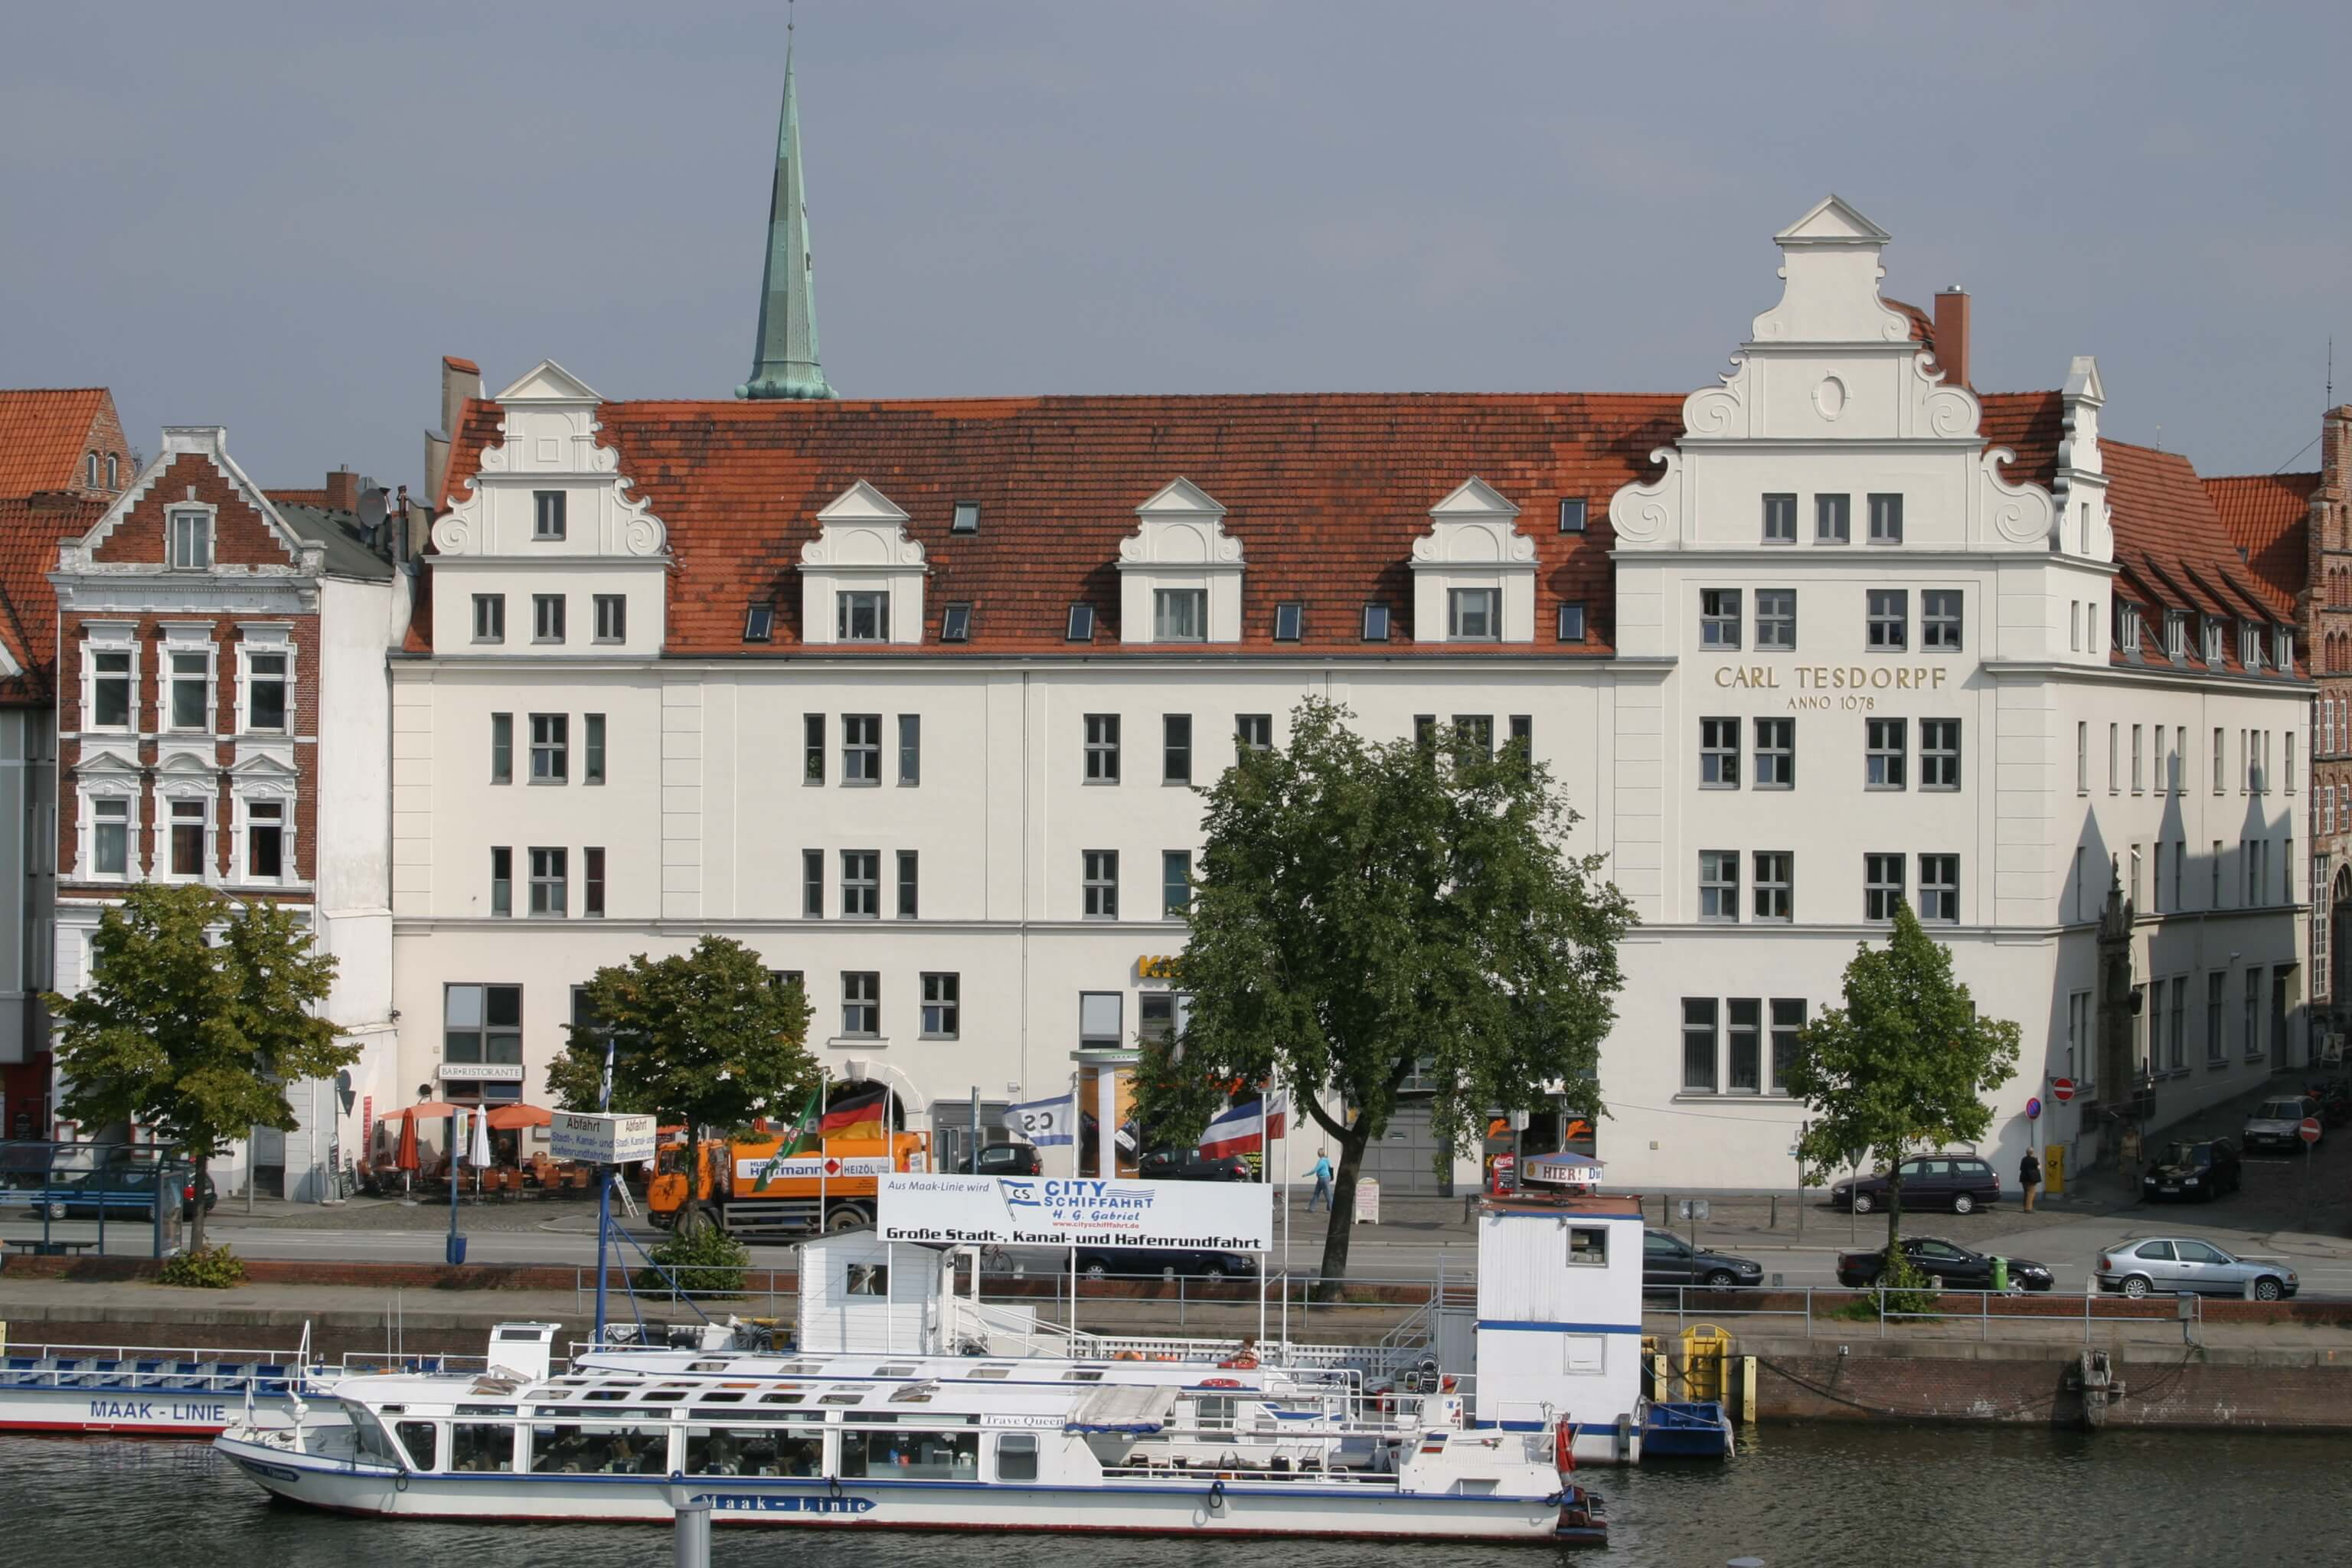 Tesdorpfhaus